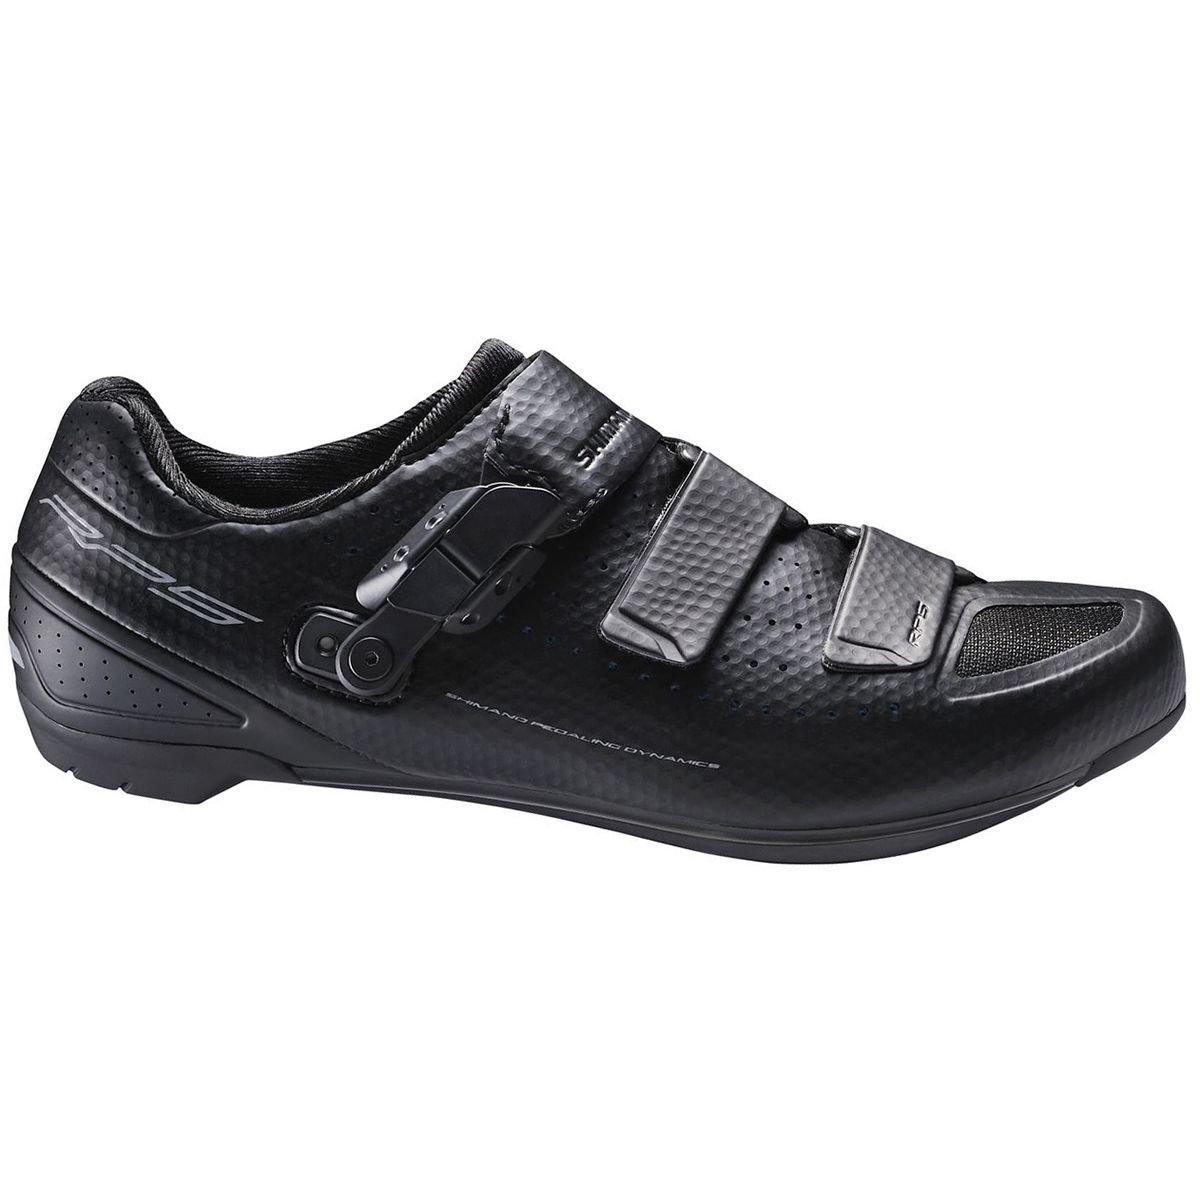 Shimano SH-RP5 Road Shoes 2016 43 BLACK by Shimano (Image #1)